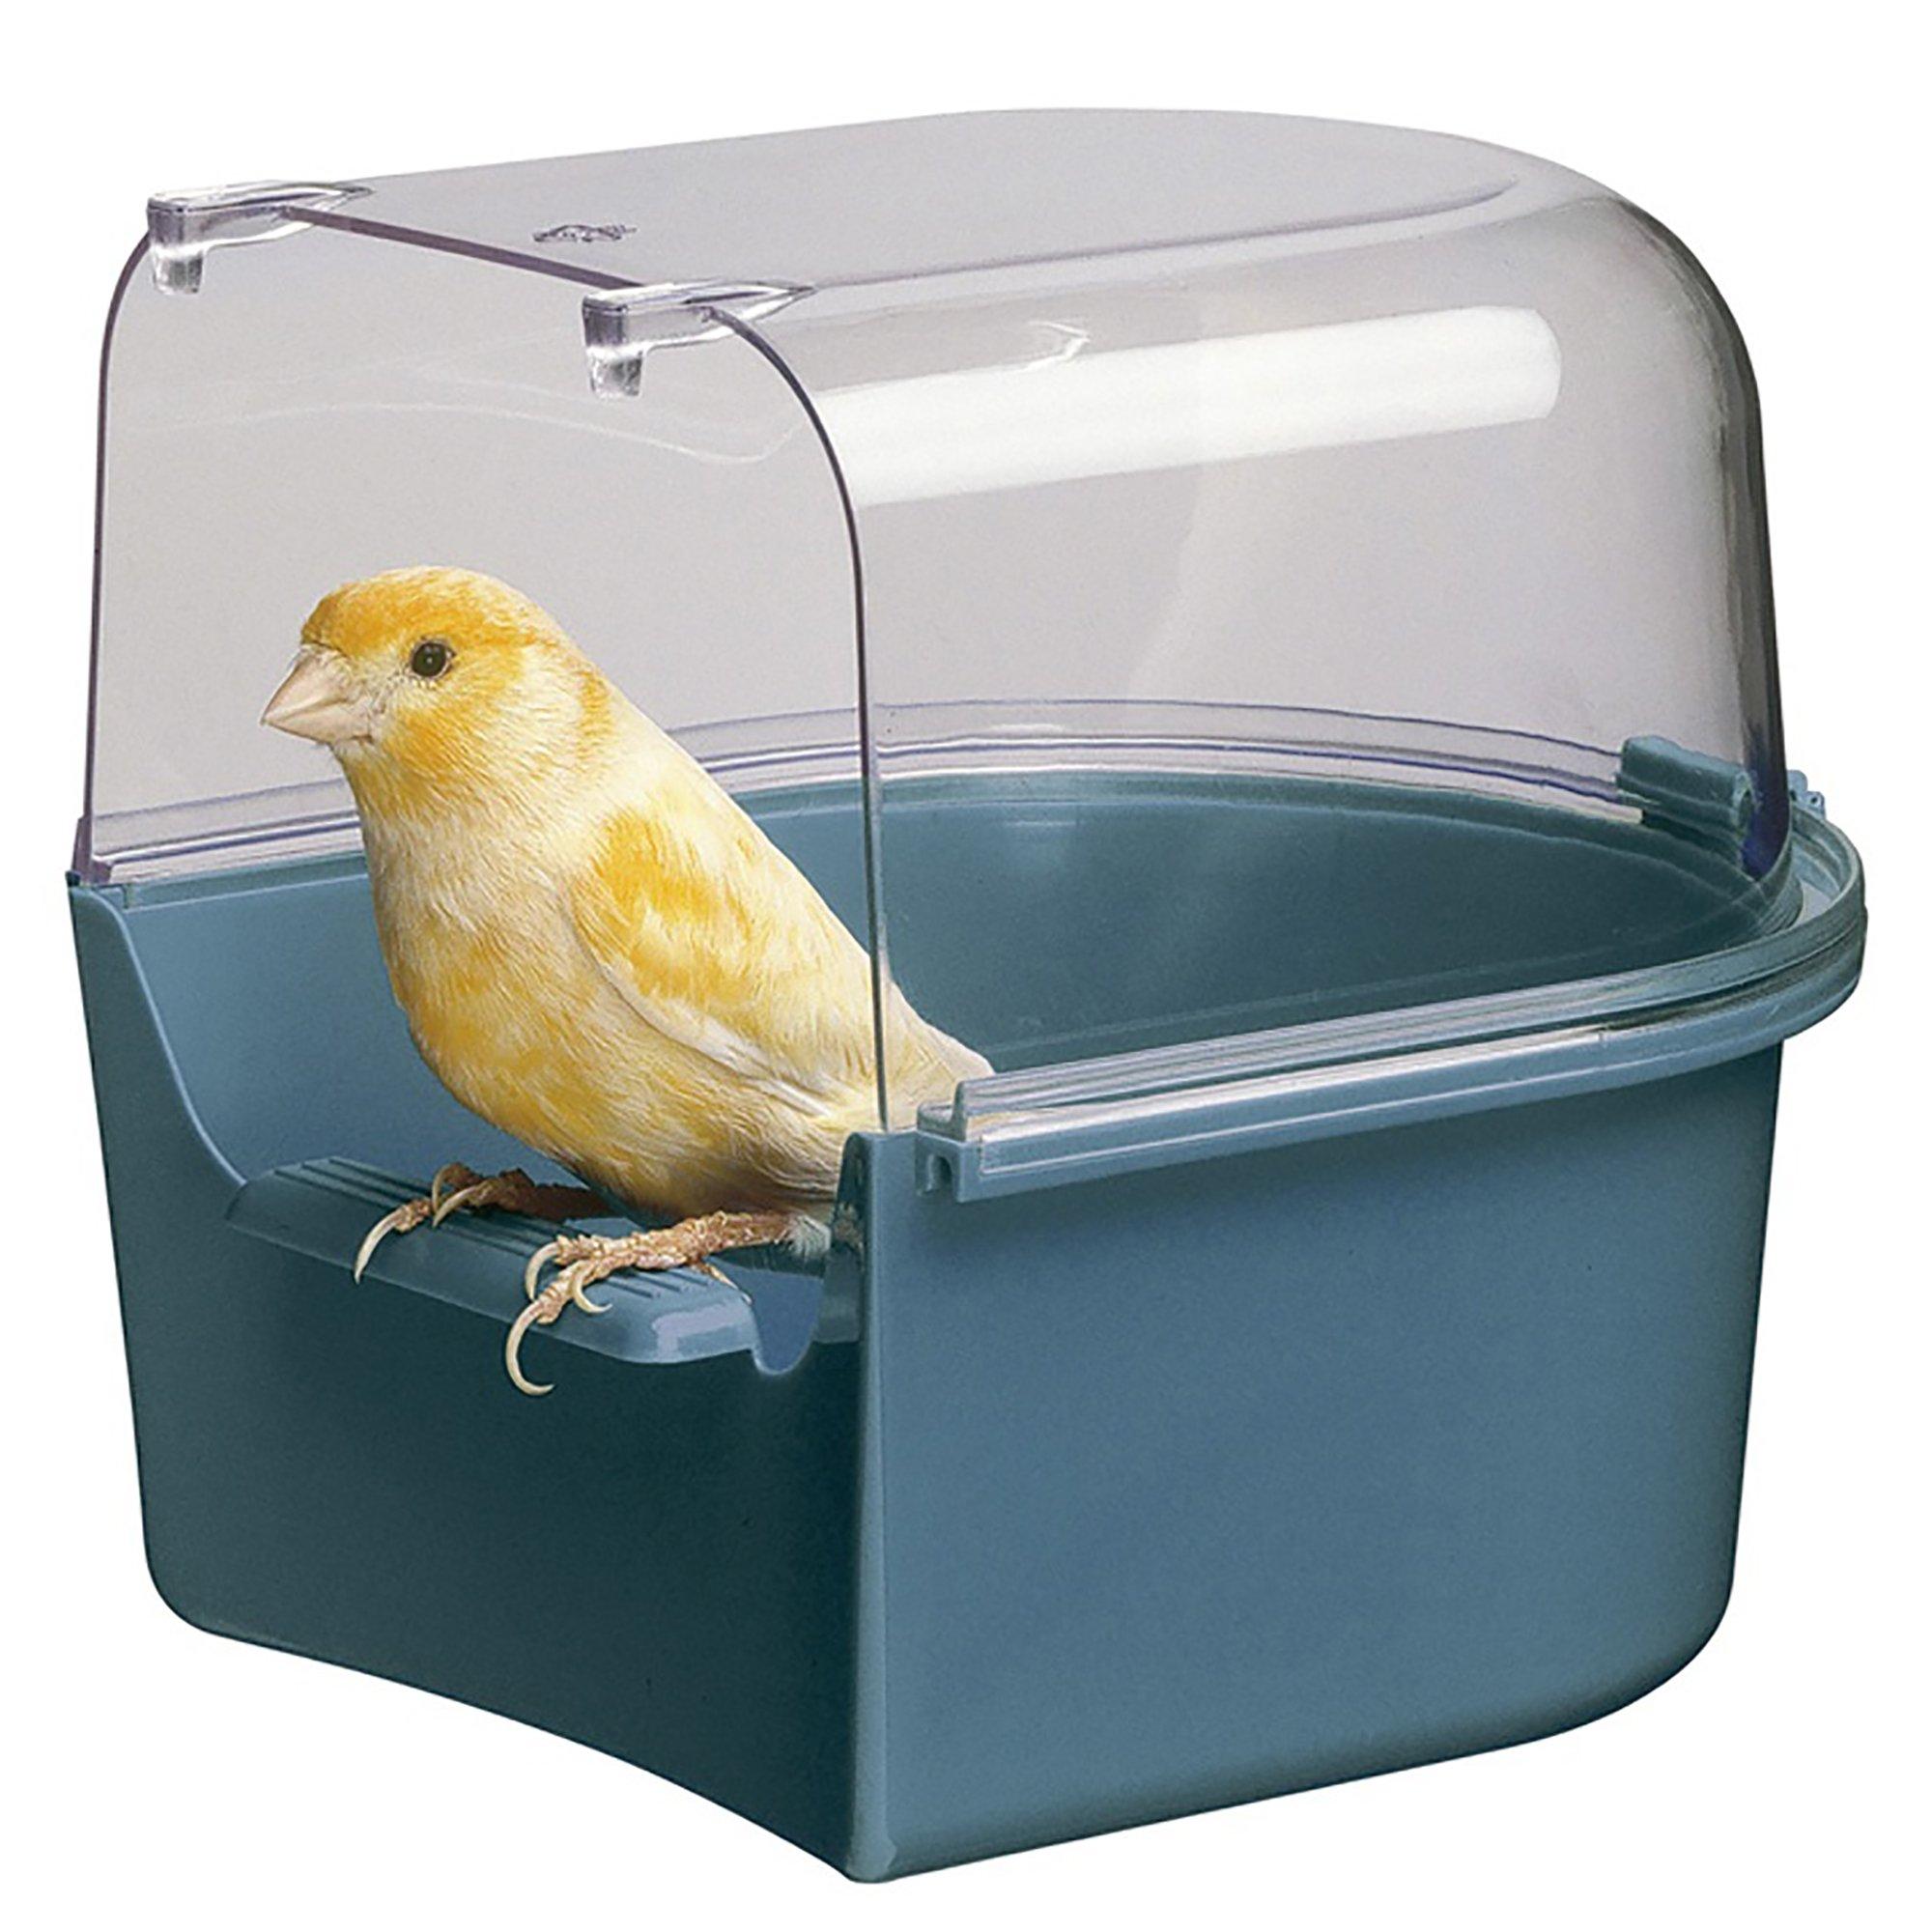 Cheap Bird Bath Sale, find Bird Bath Sale deals on line at Alibaba.com